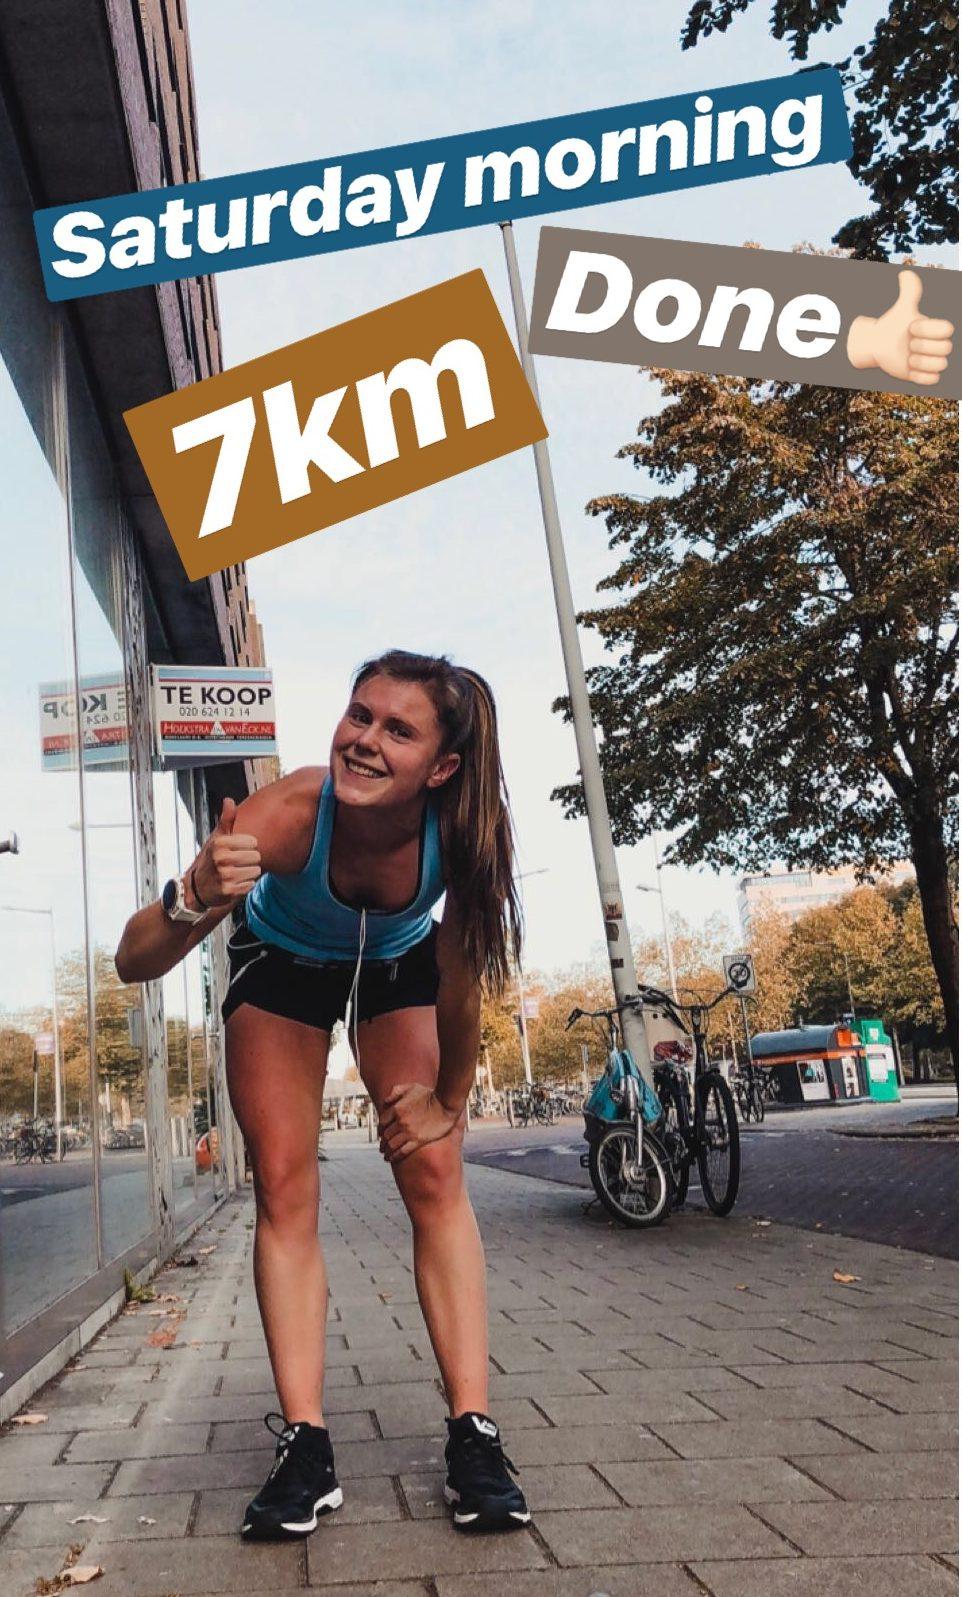 7km run